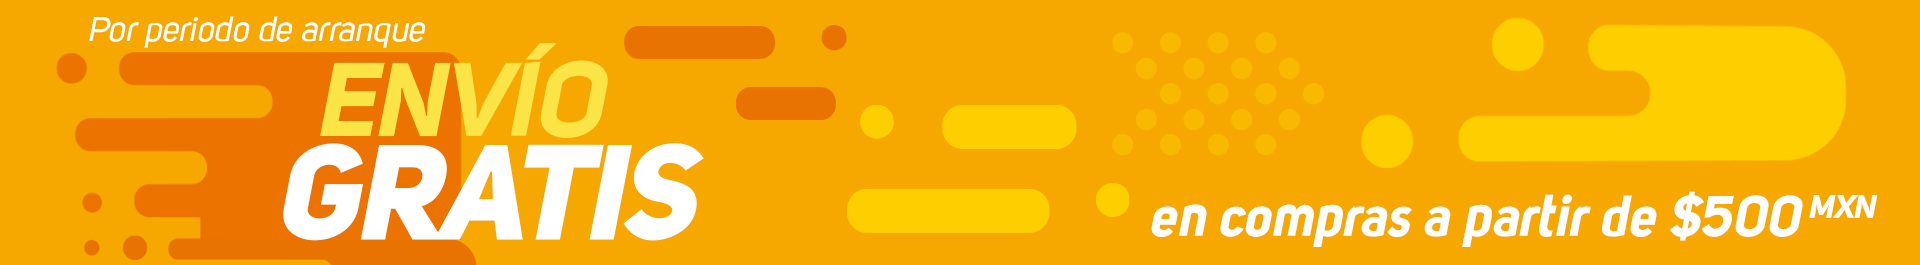 Banner-Envios-2.png